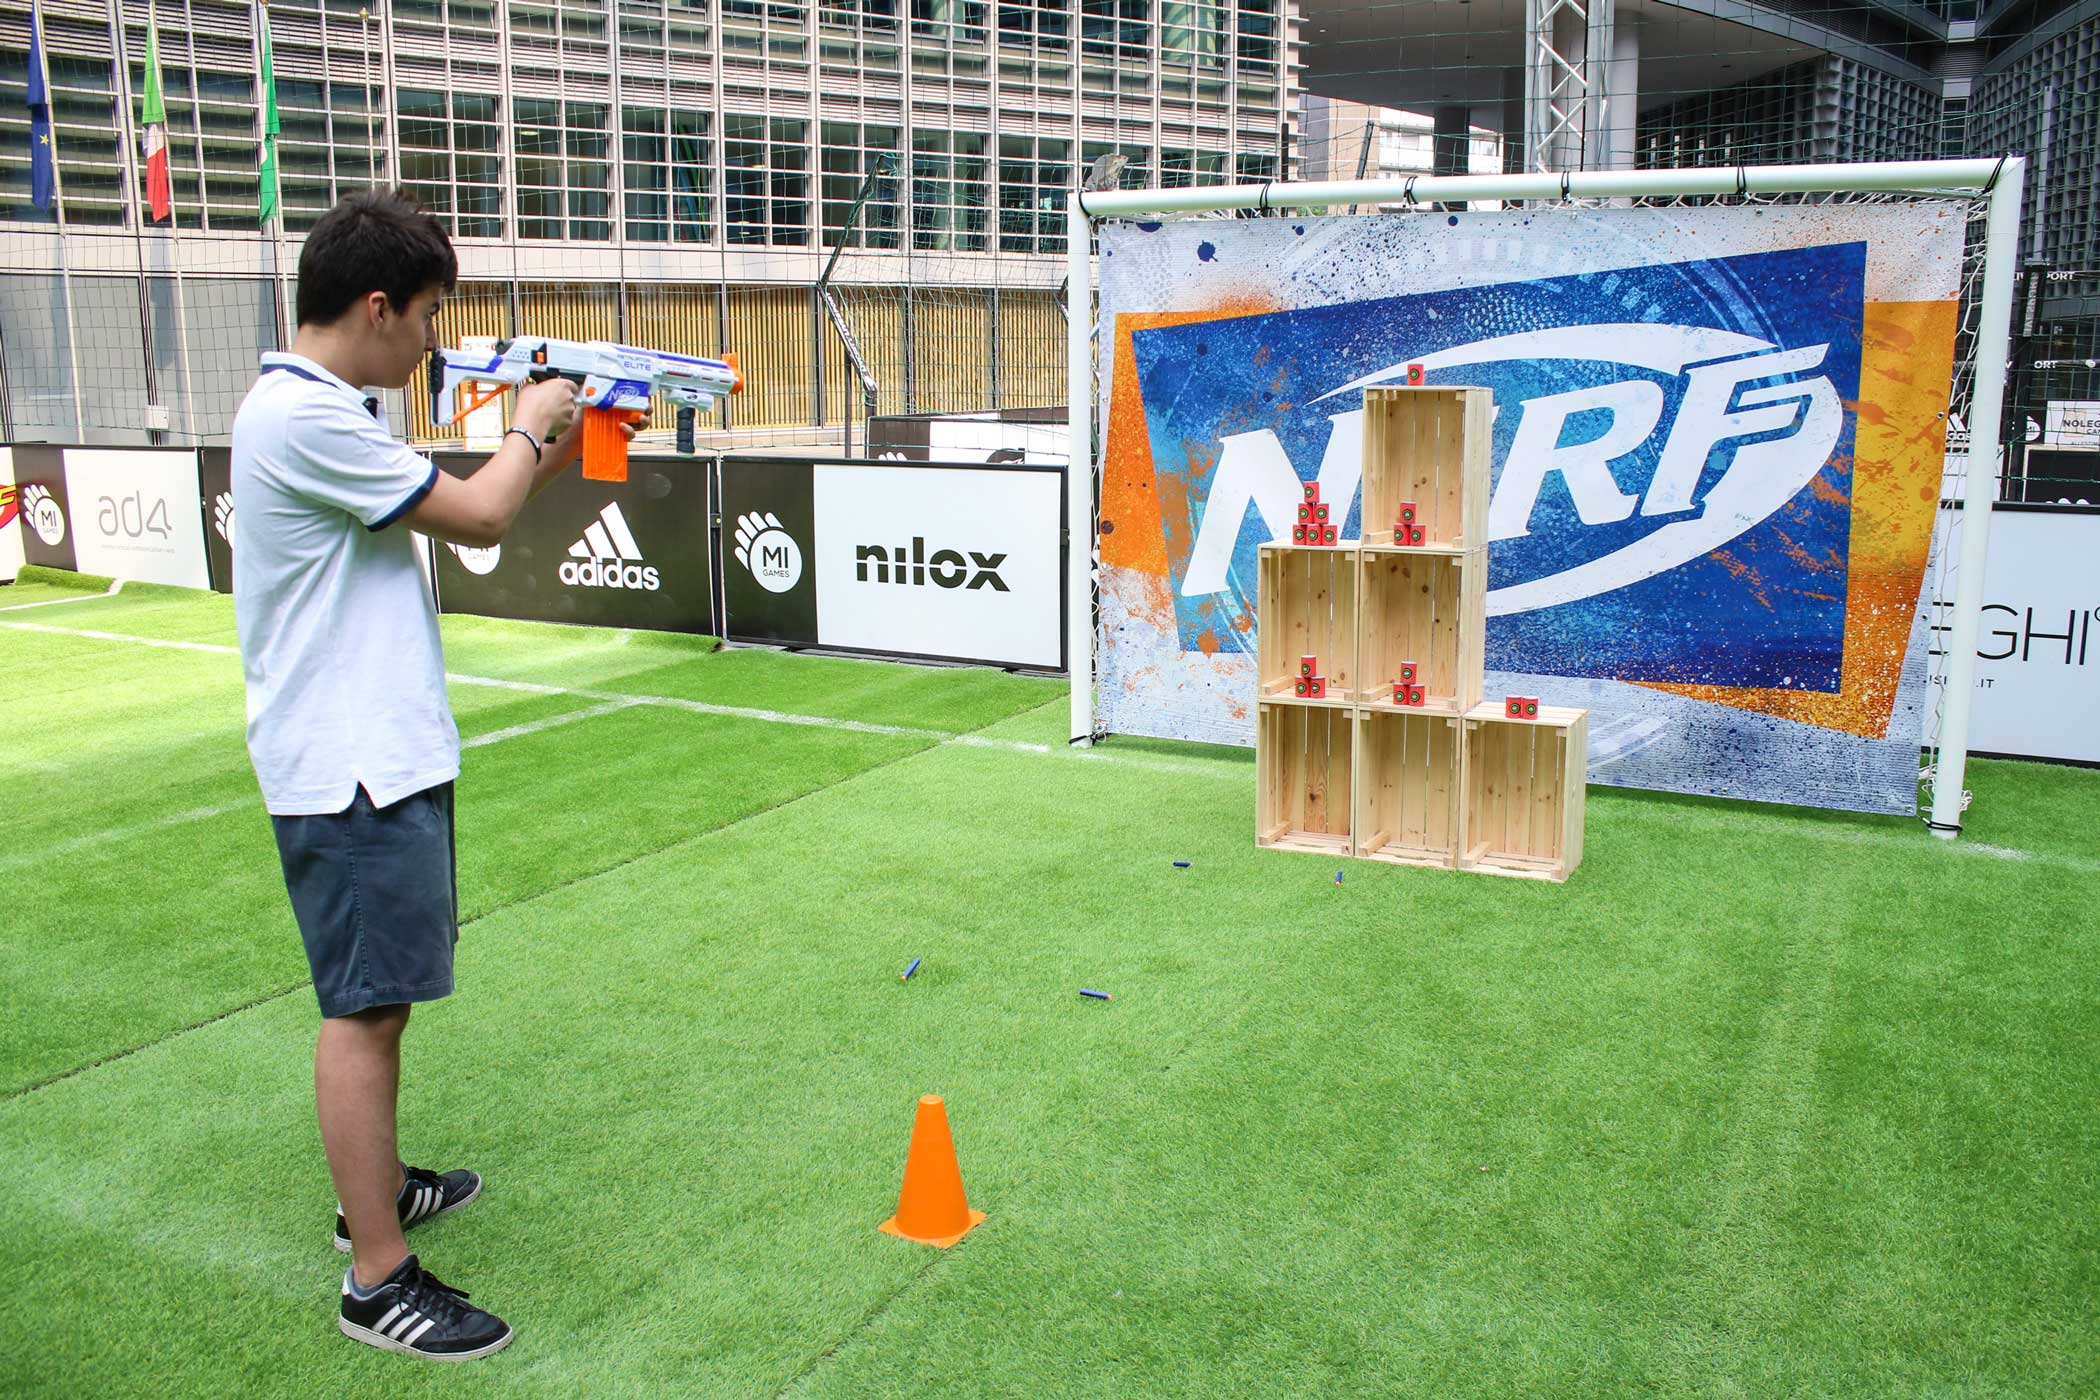 Nerf Activity - 2018 - Mi Games